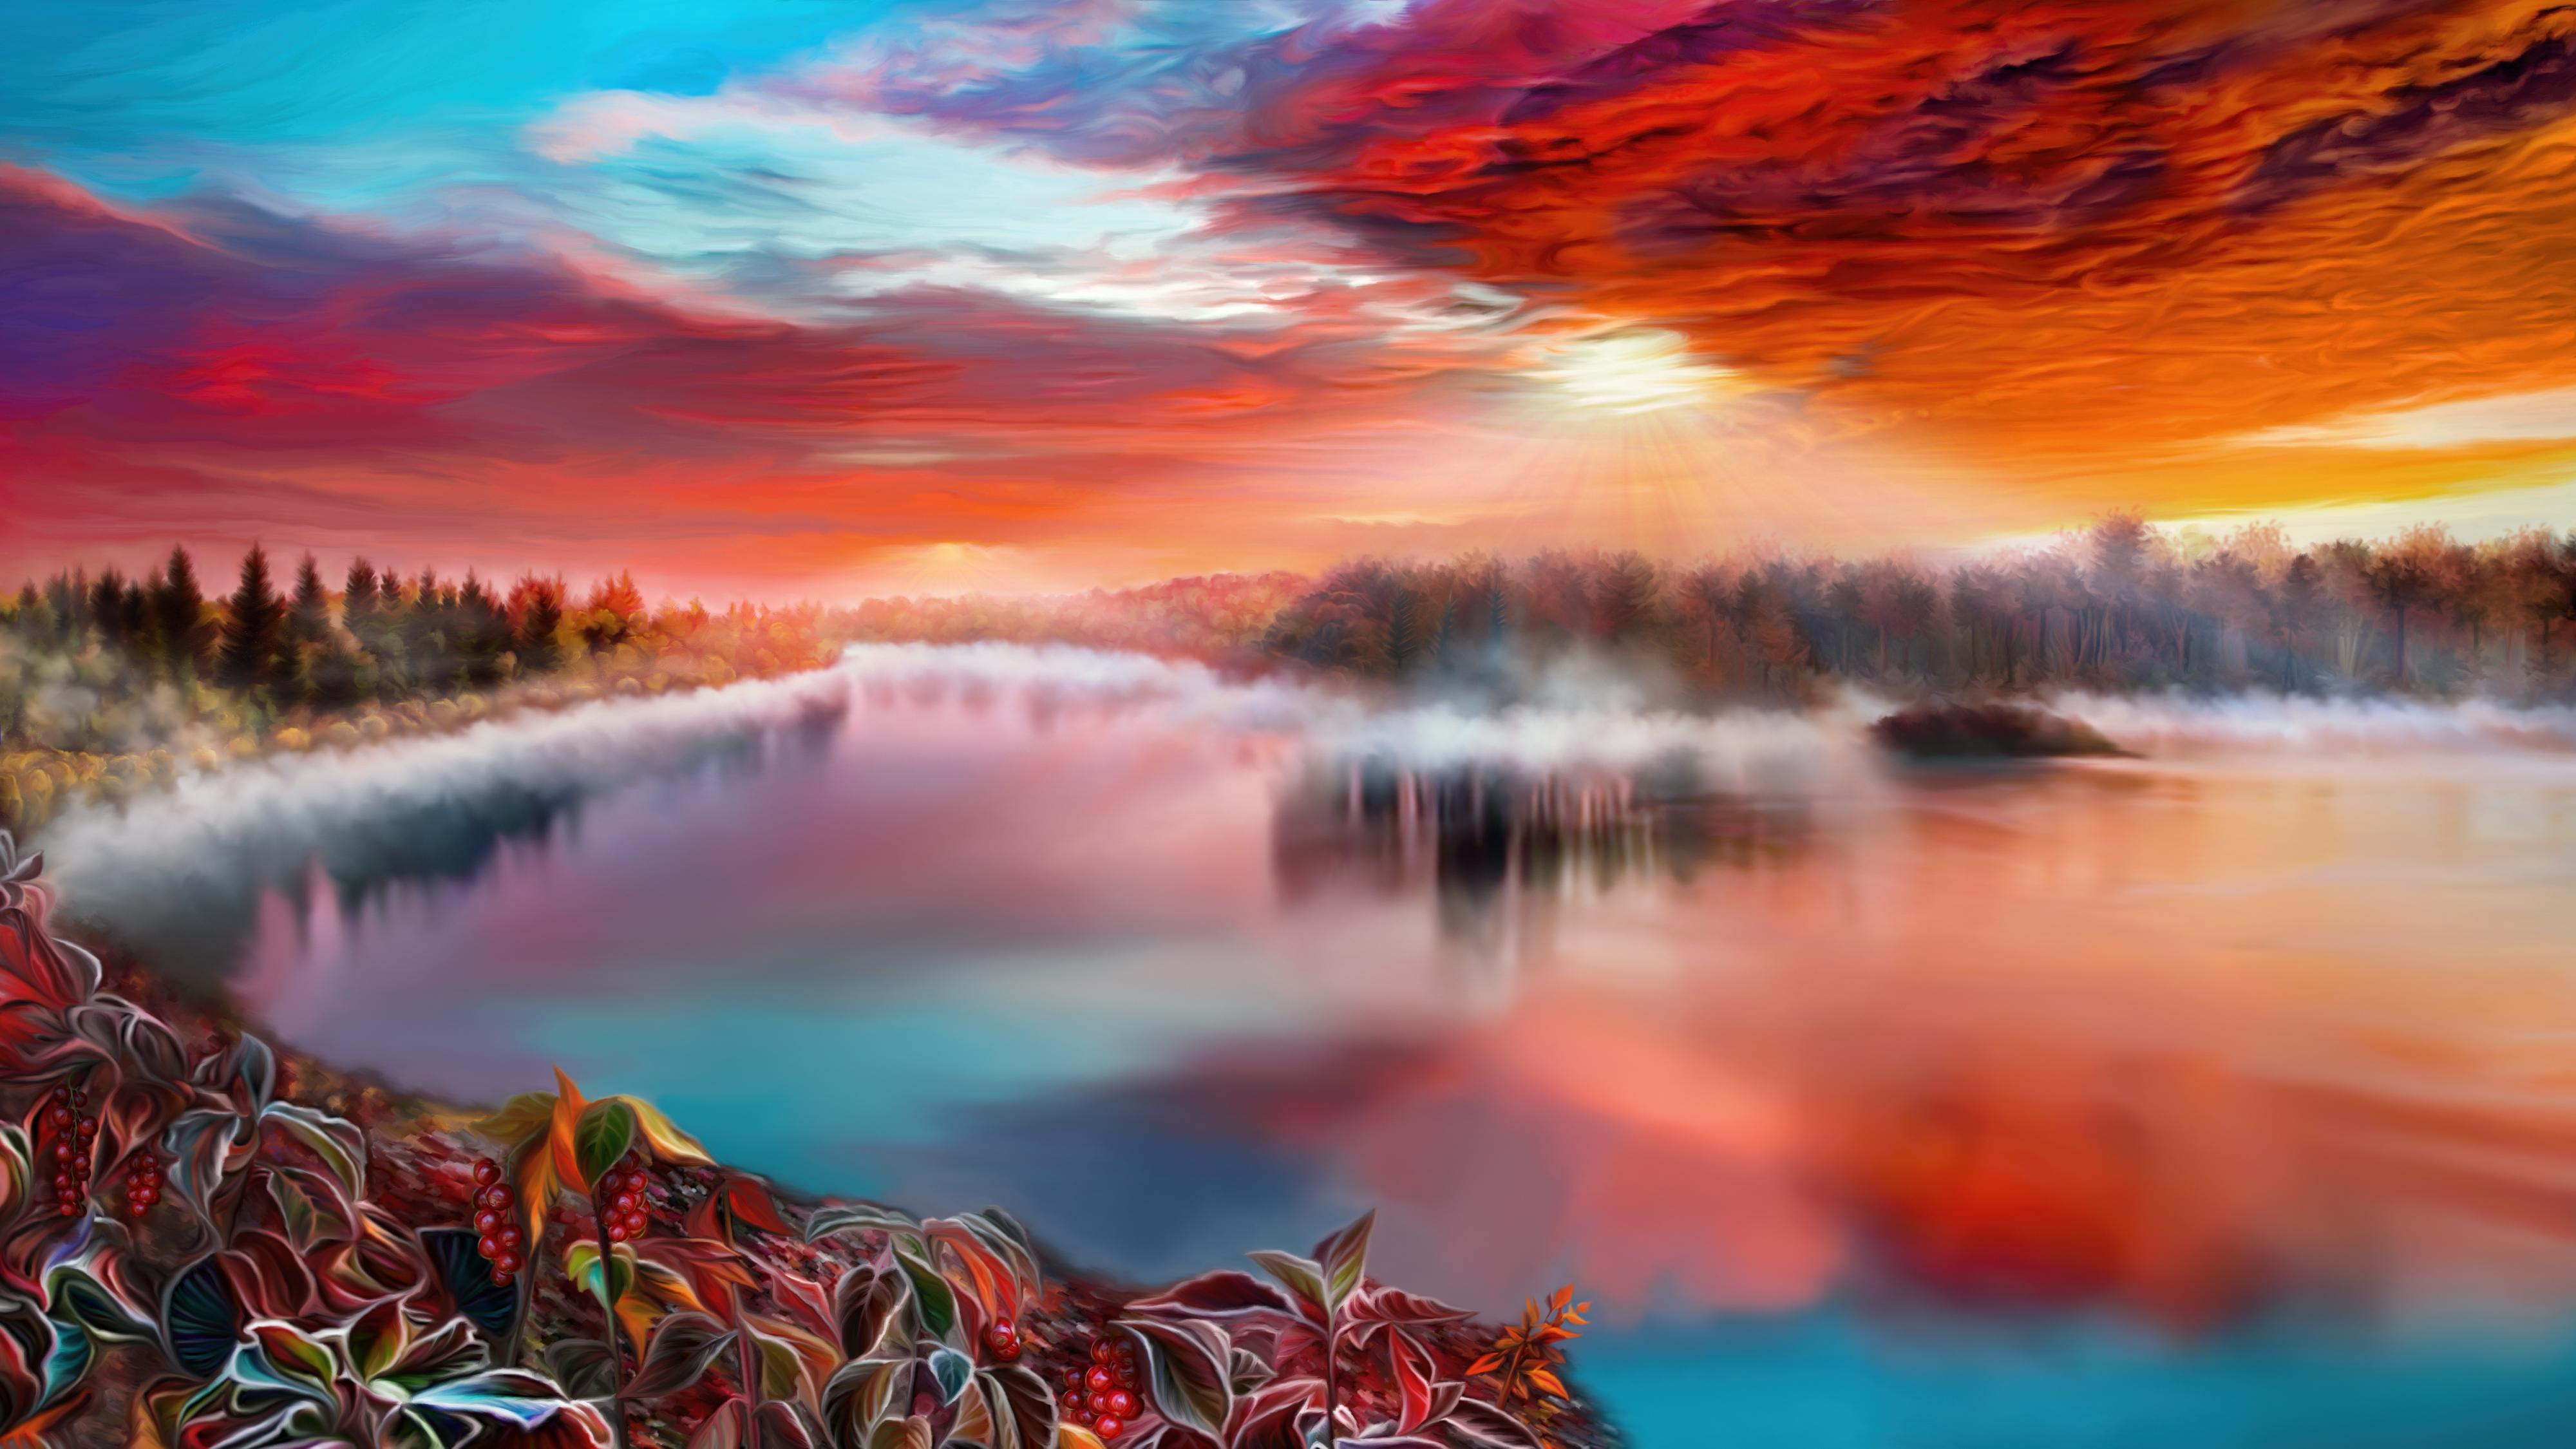 Misty river evening by exobiology